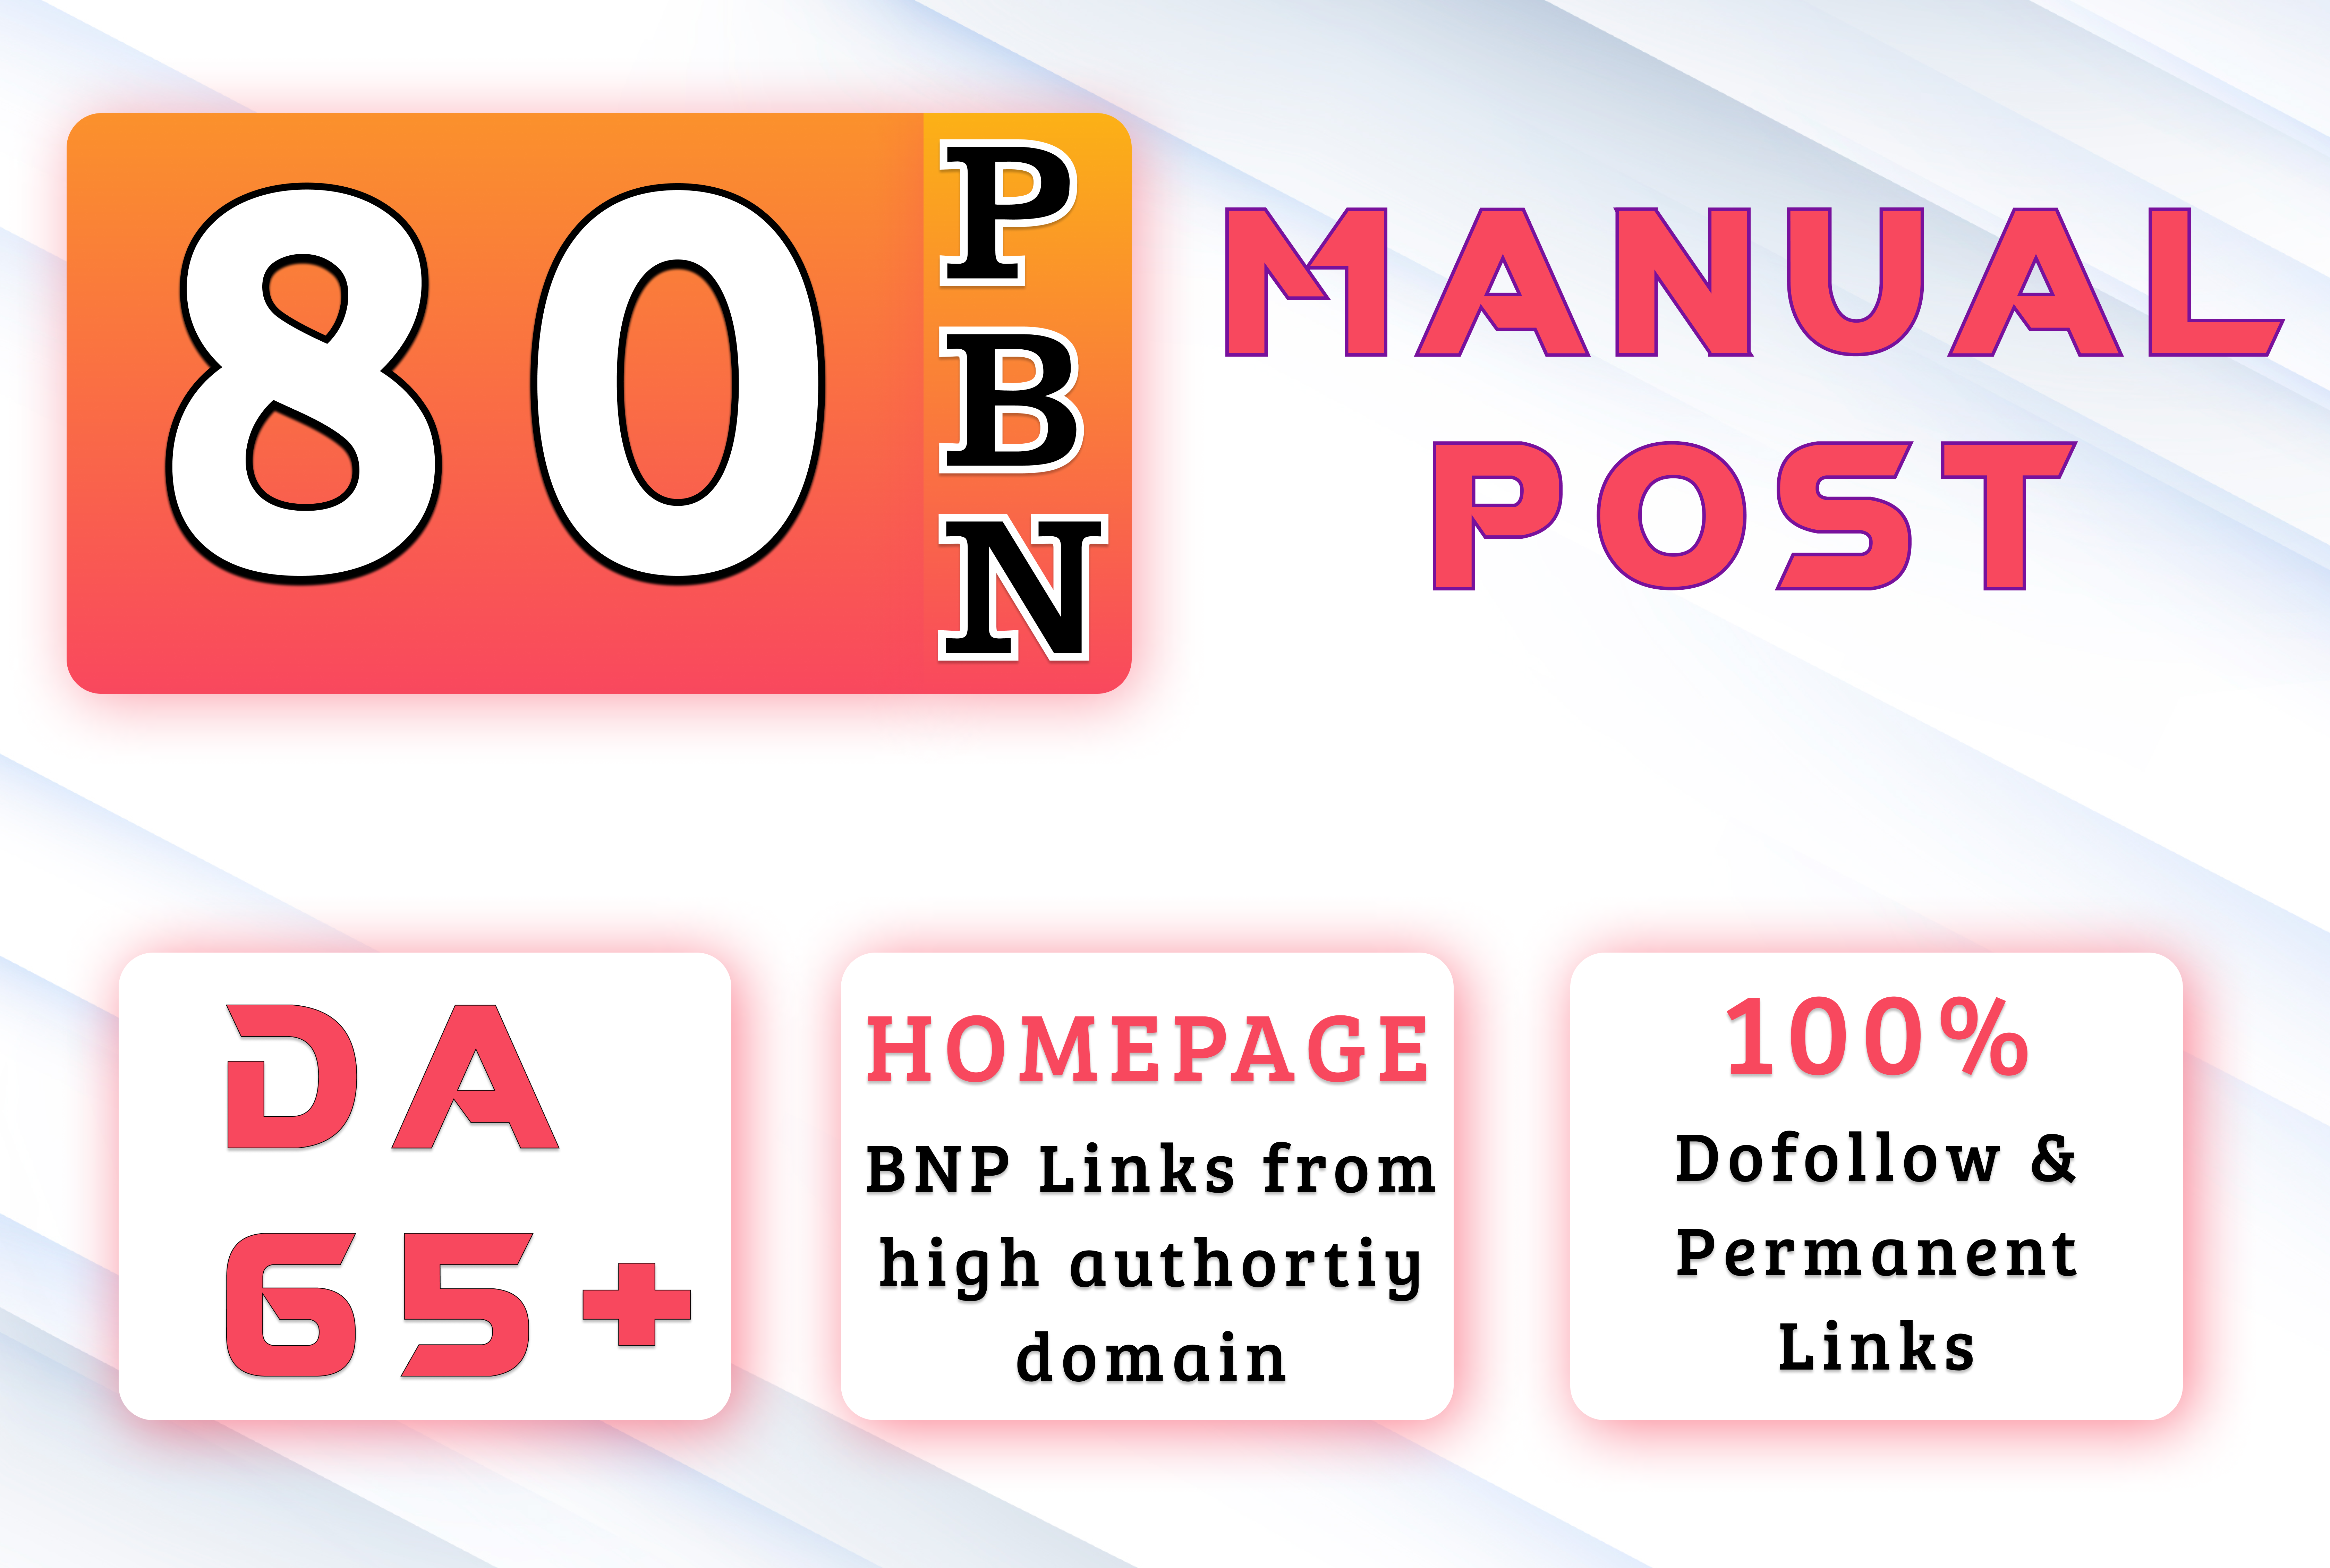 Get 80 High Quality DA 60+ Permanent HomePage Dofollow PBN Links